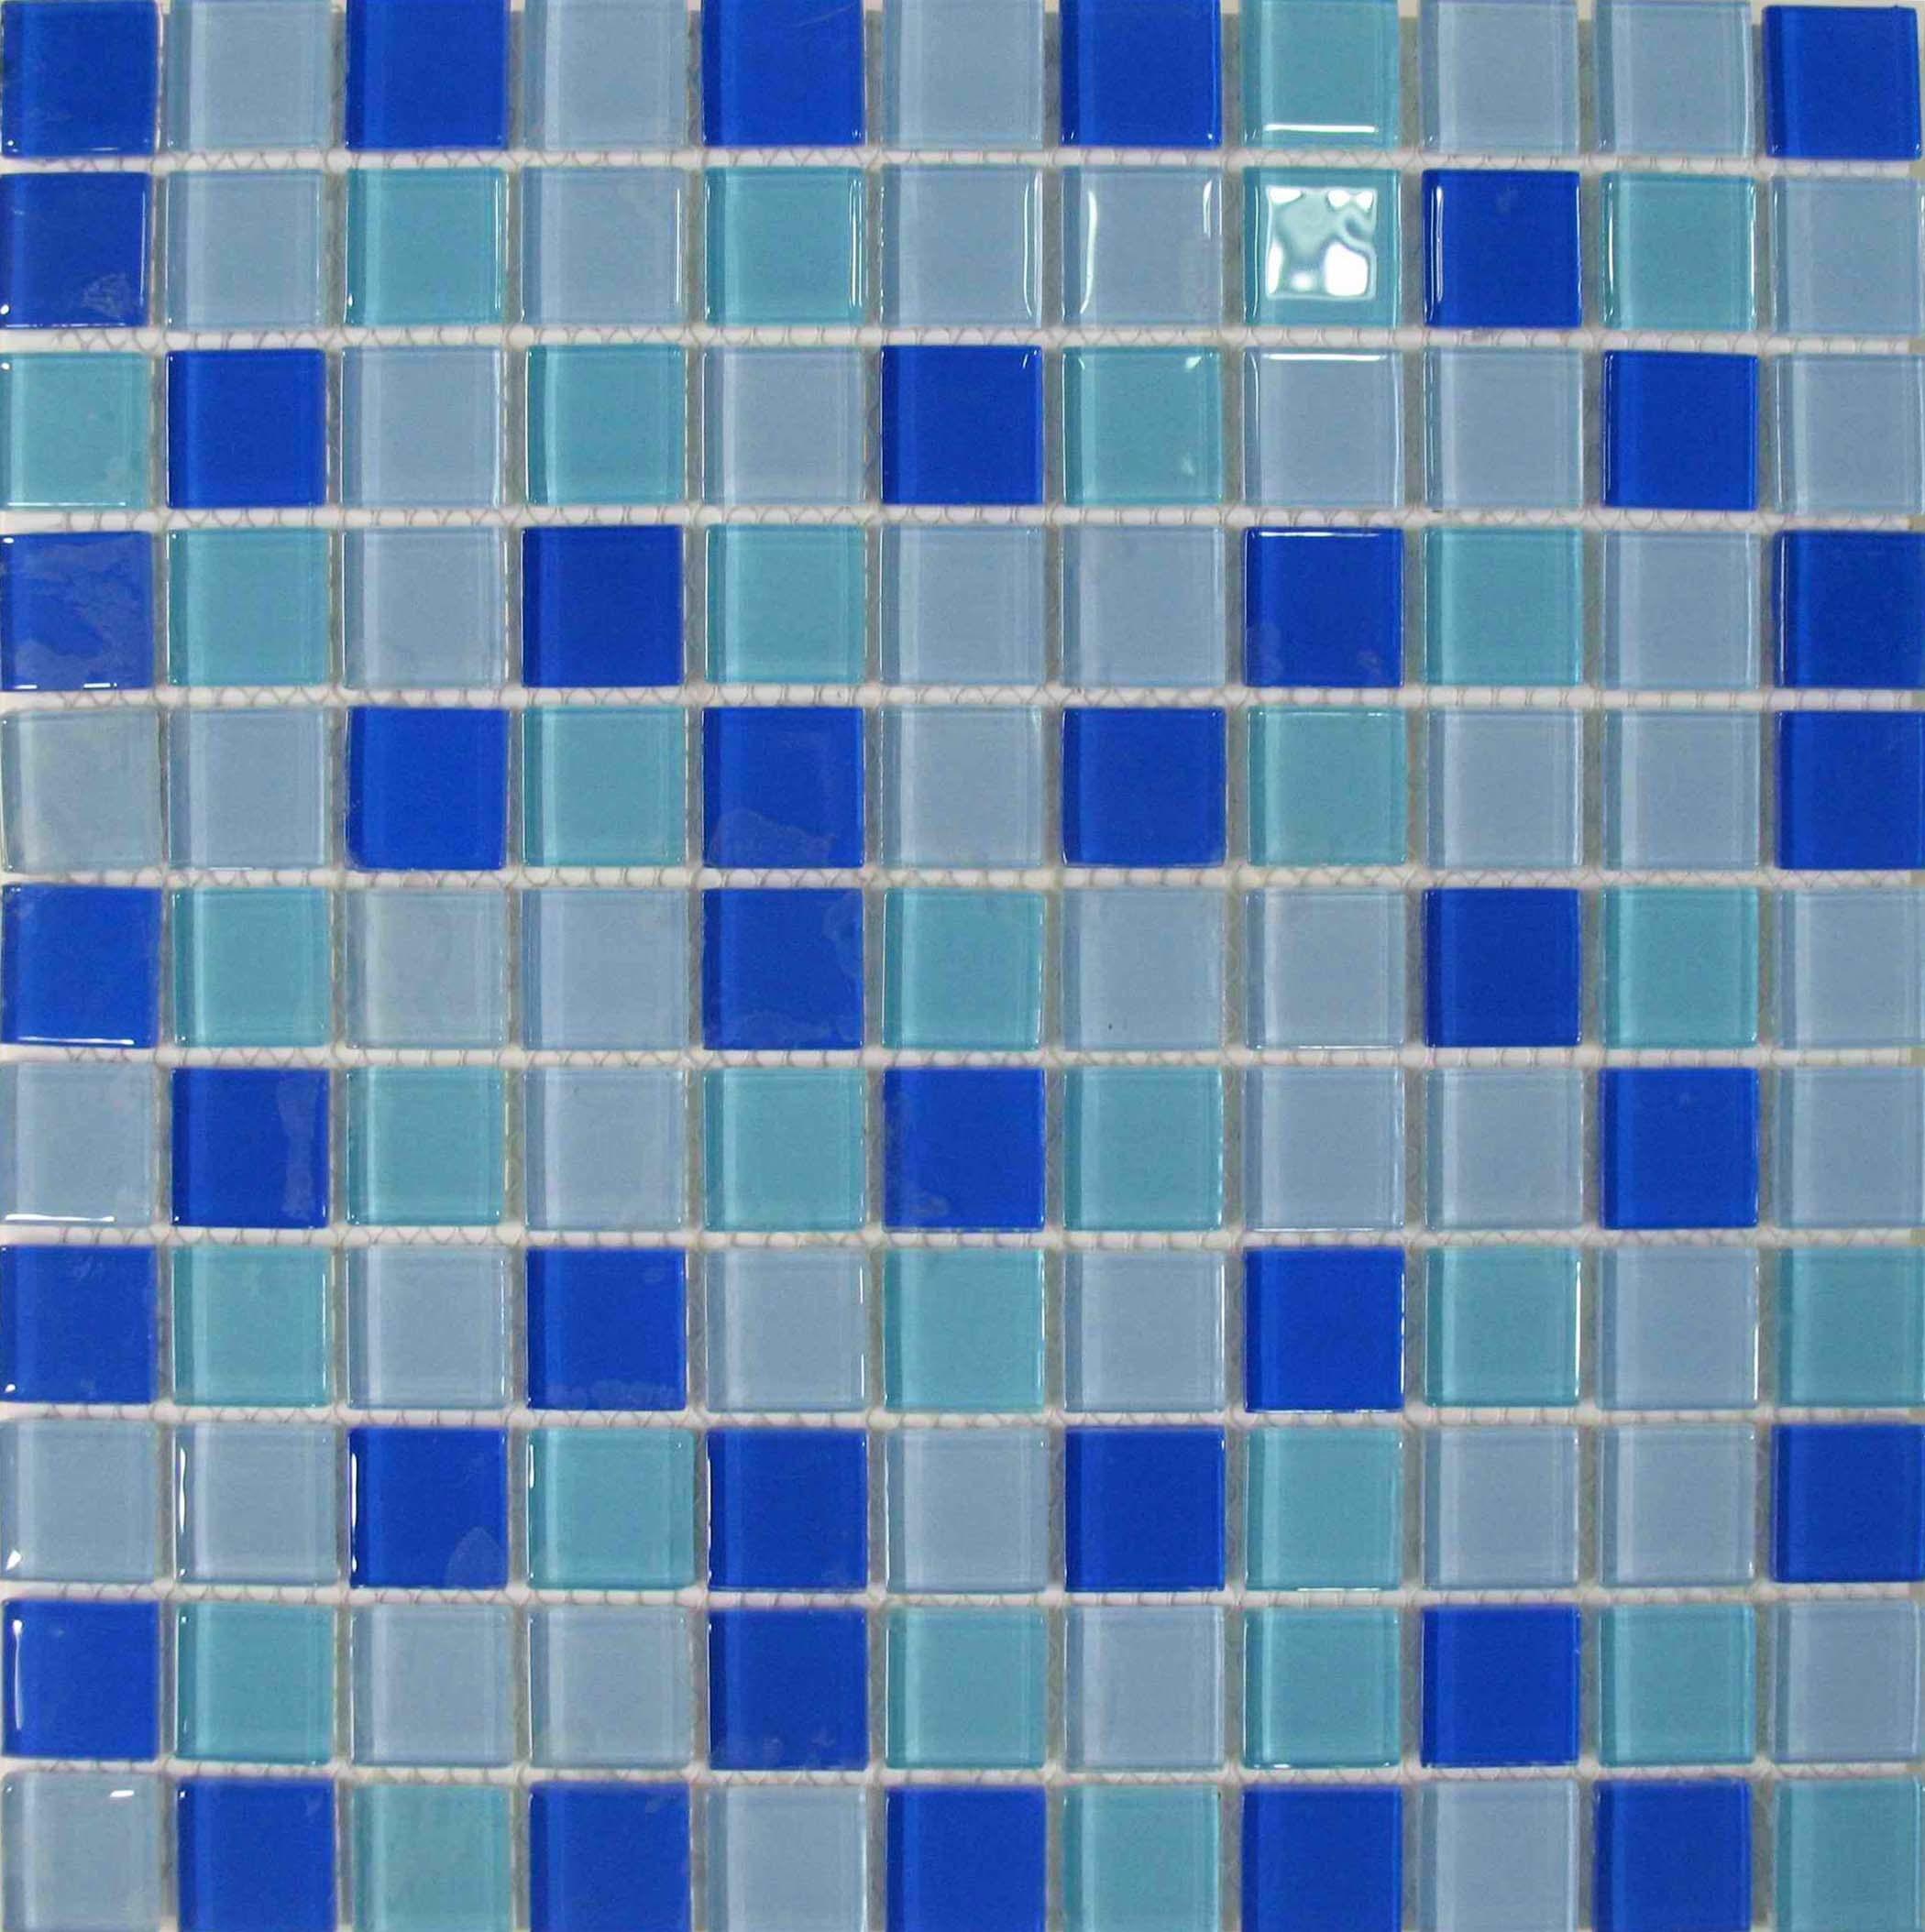 Ksl c10002 for Azulejo para pared de sala